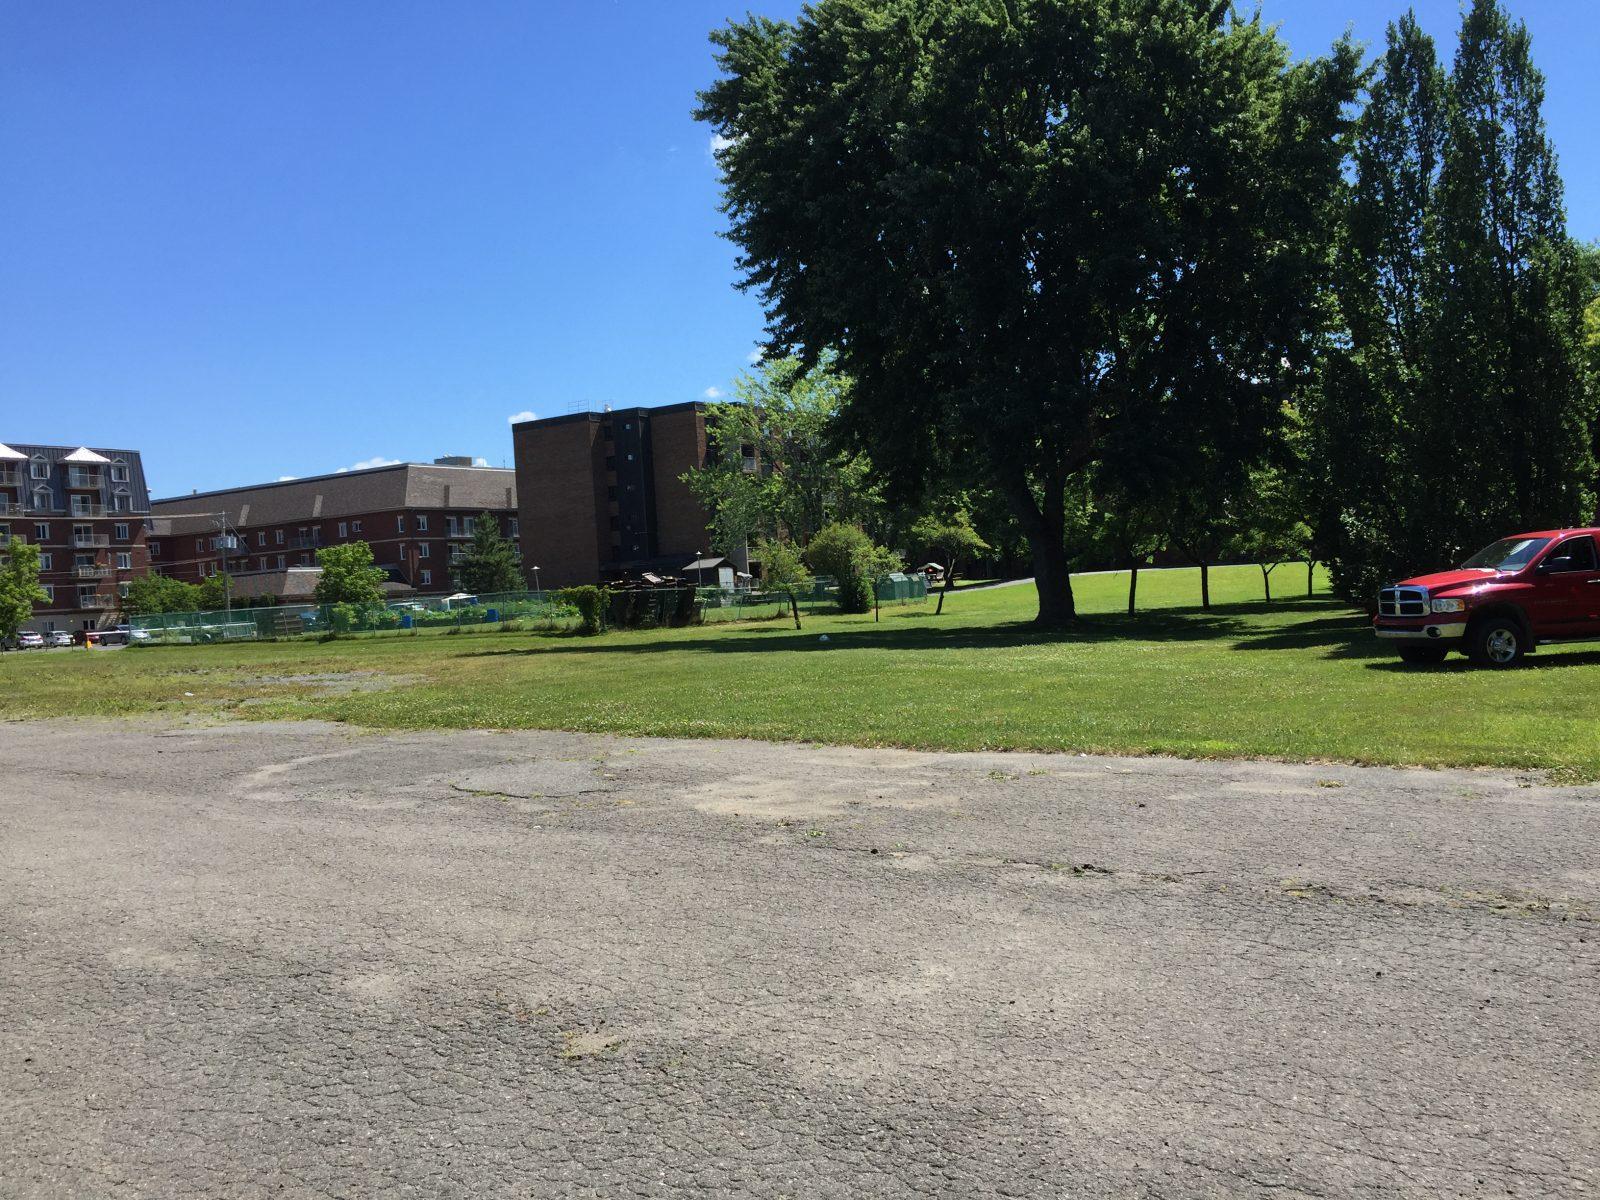 Feu vert pour les 48 logements de la Villa du Parc